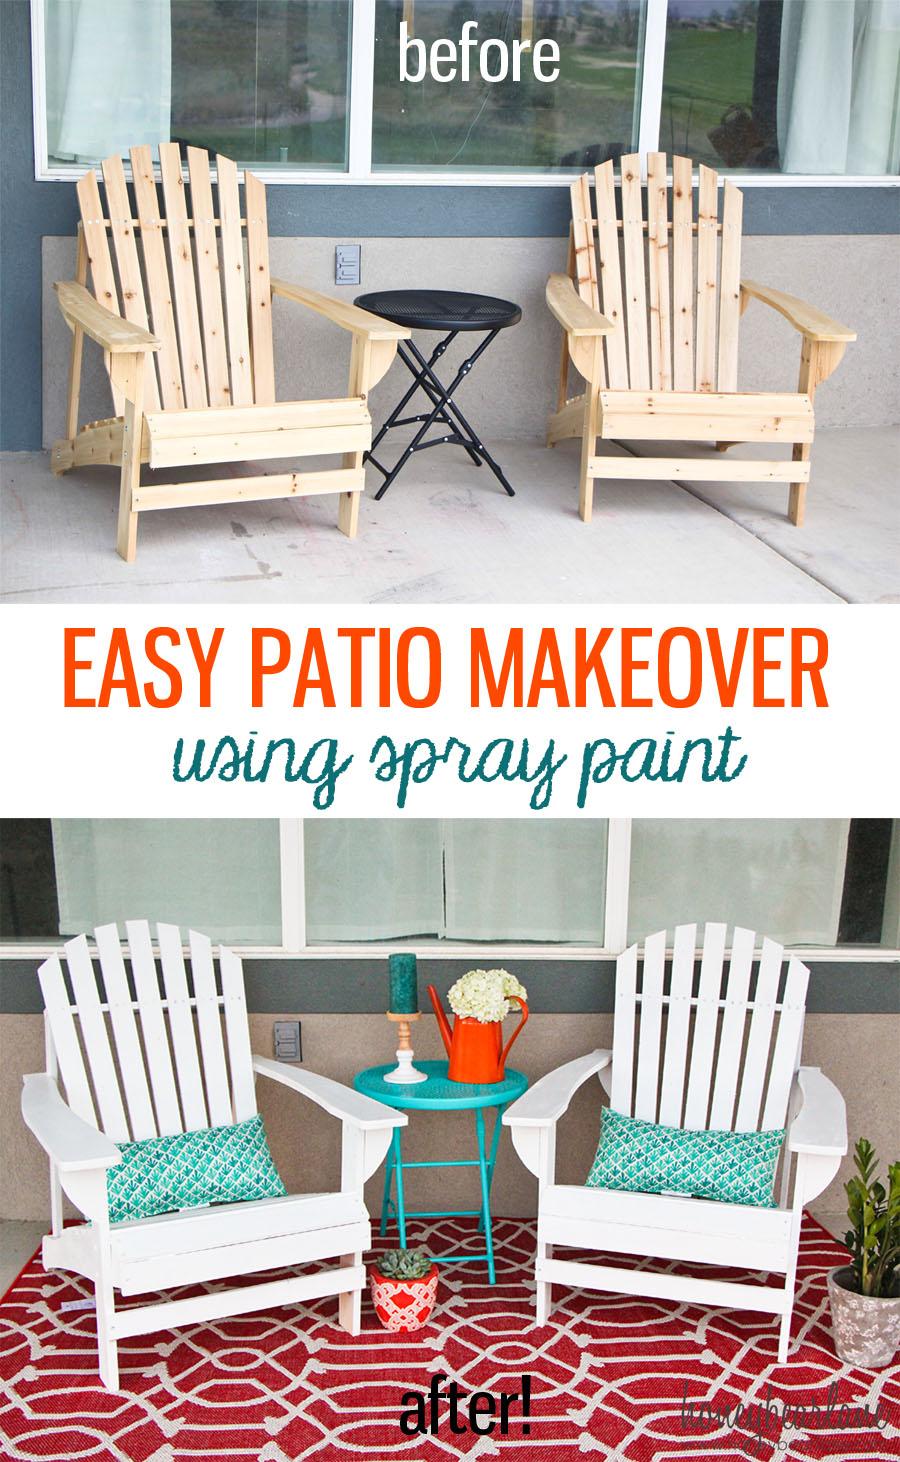 Easy Patio Makeover - HoneyBear Lane on Backyard Patio Makeover id=16450